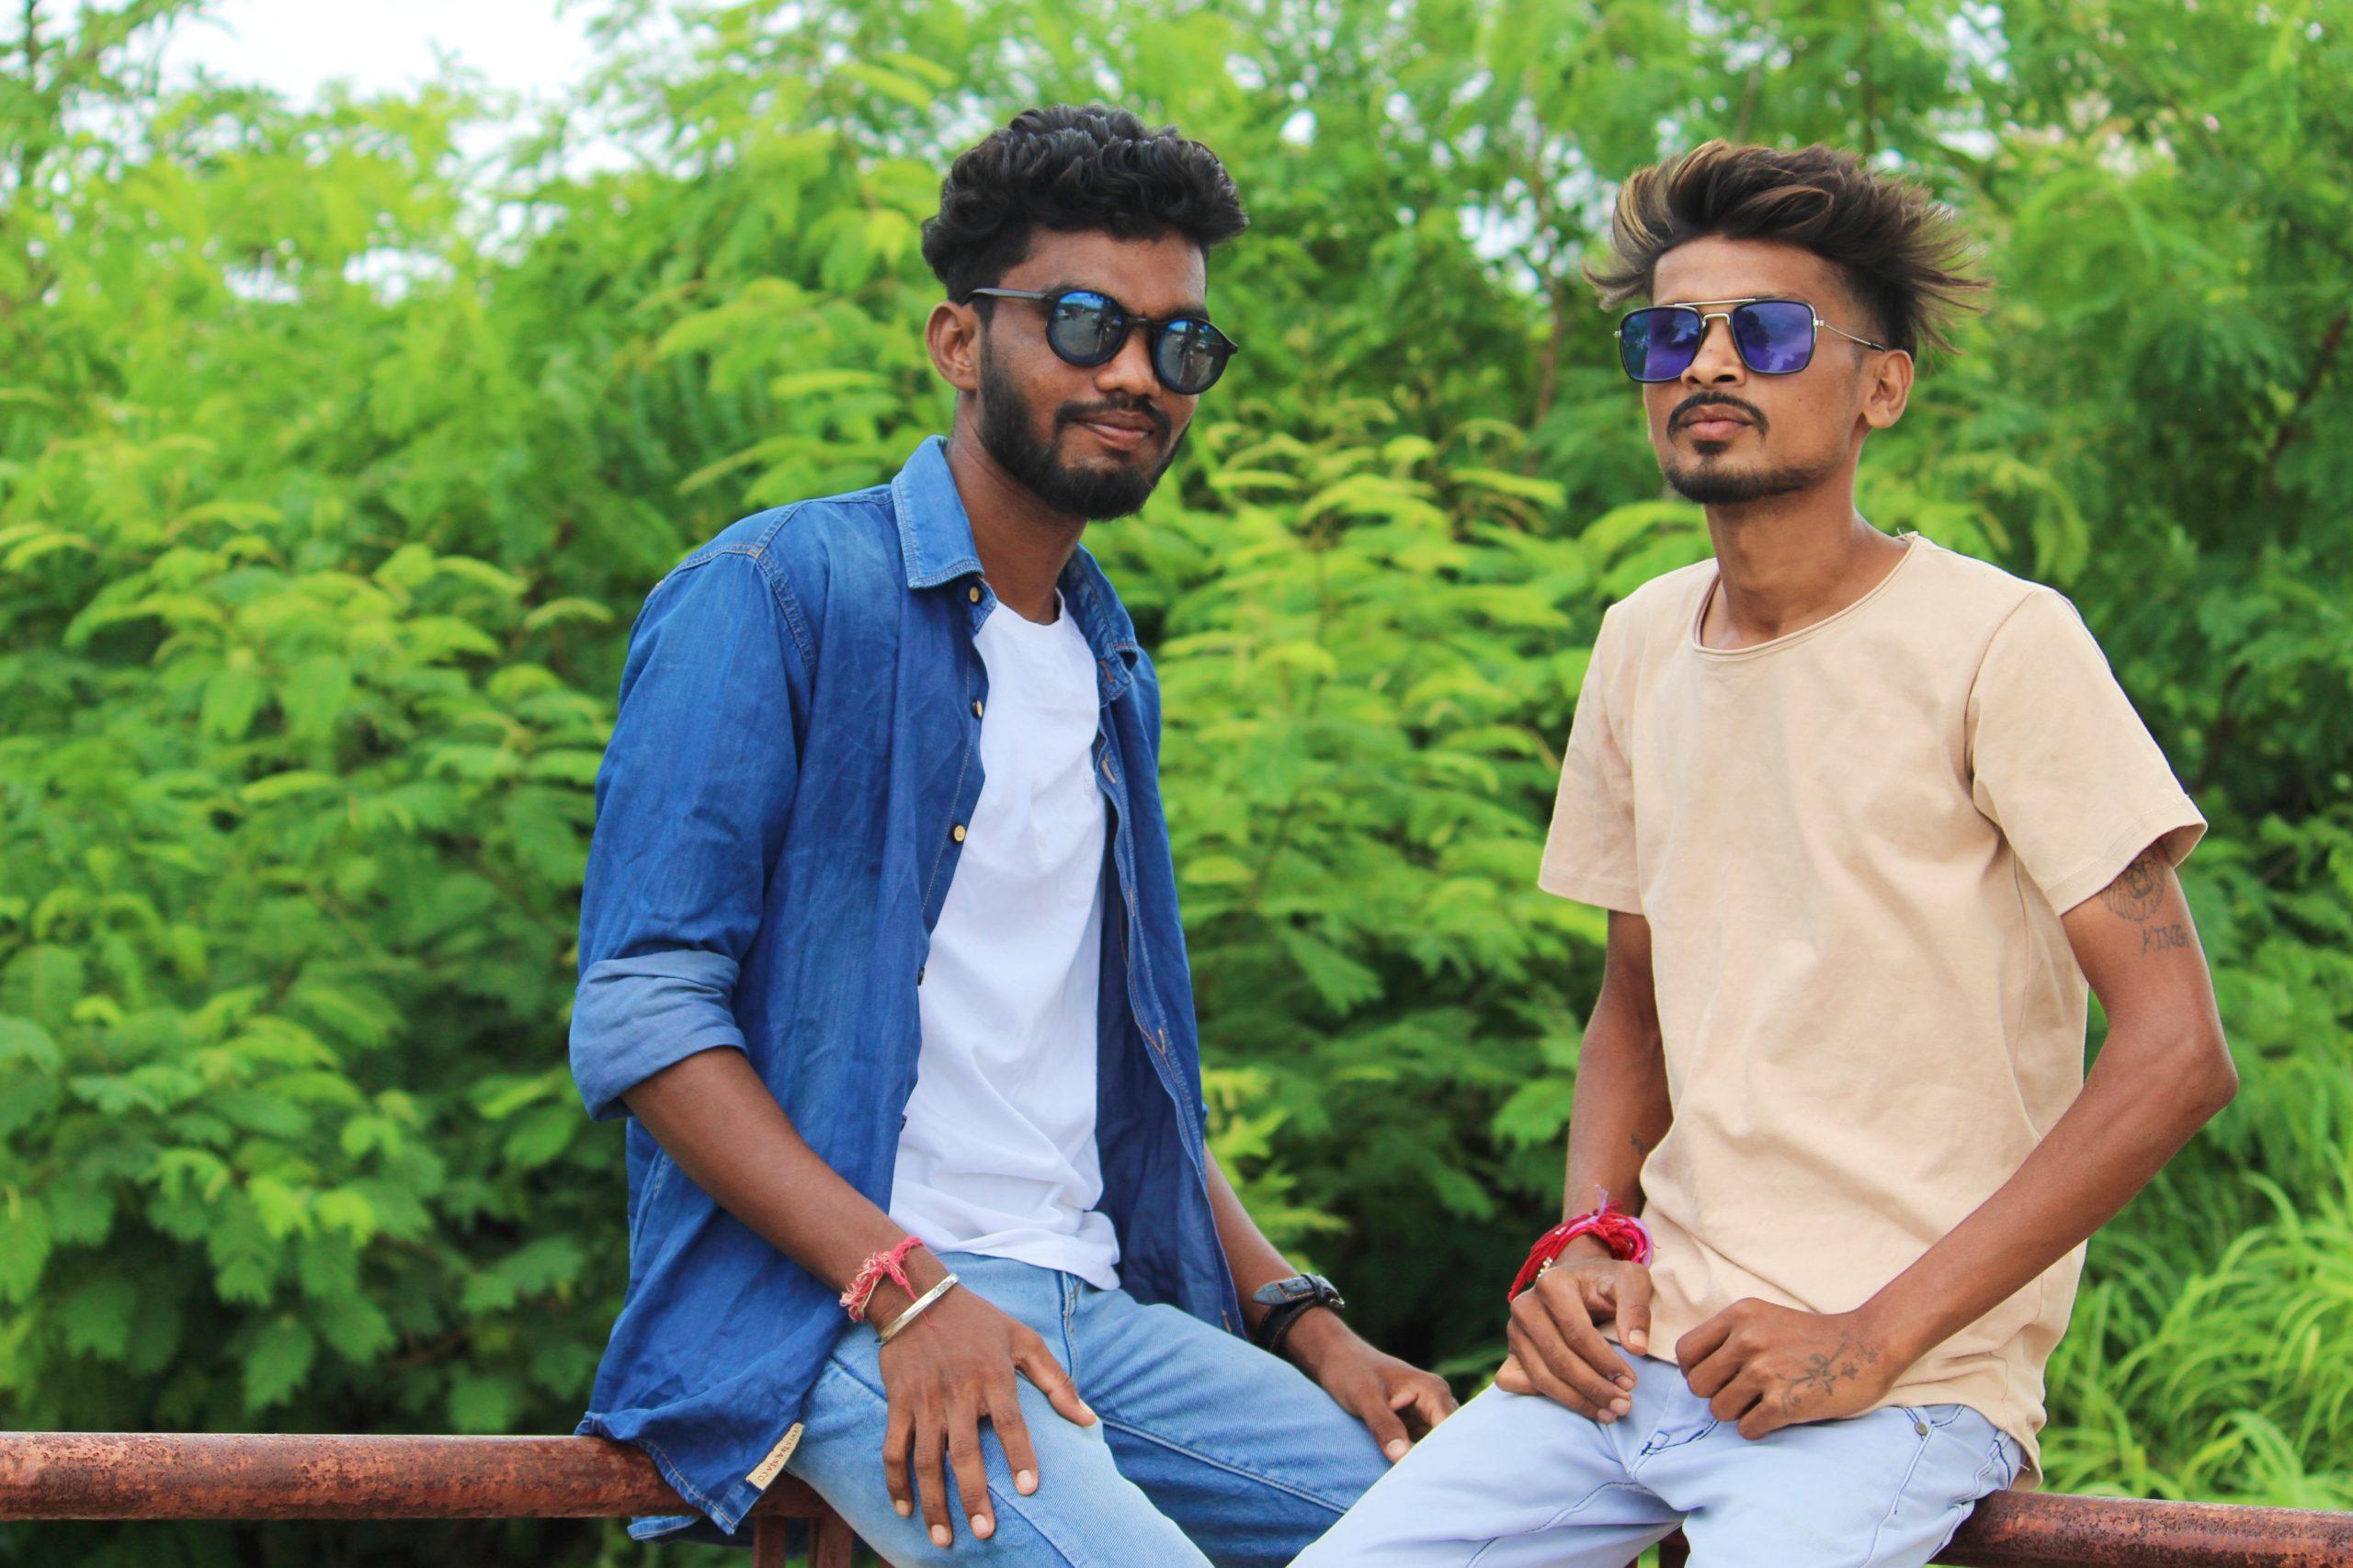 Two model boys posing